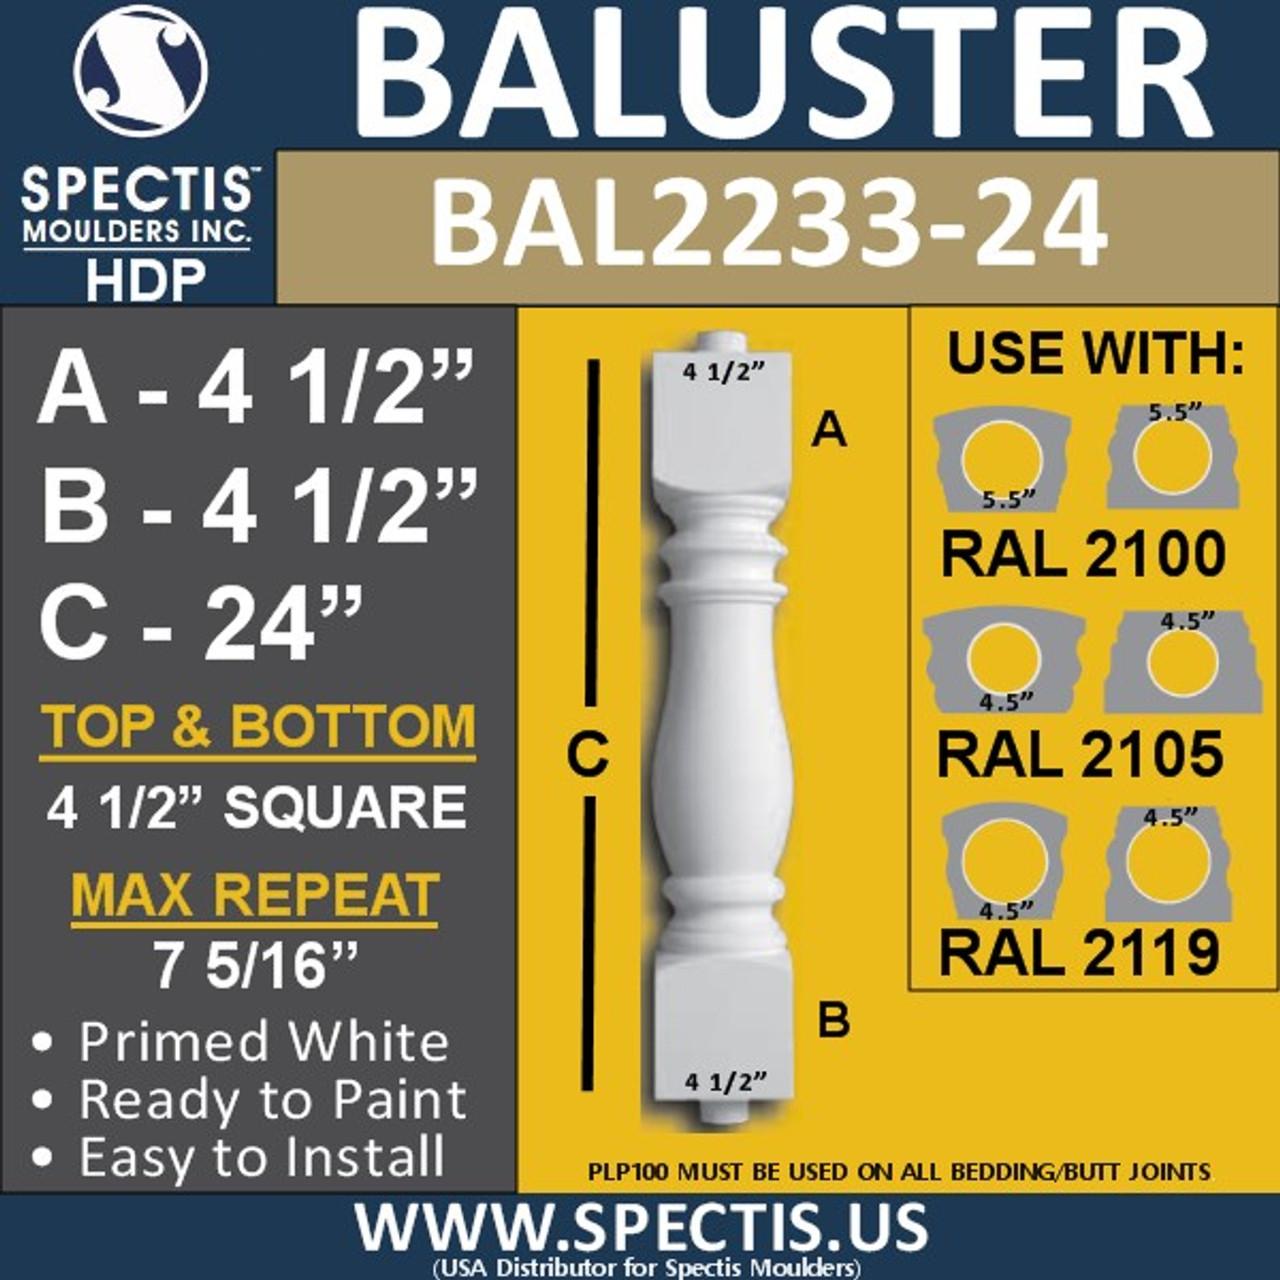 "BAL2233-24 Spectis Urethane Railing Baluster 4 1/2"" x 24"""